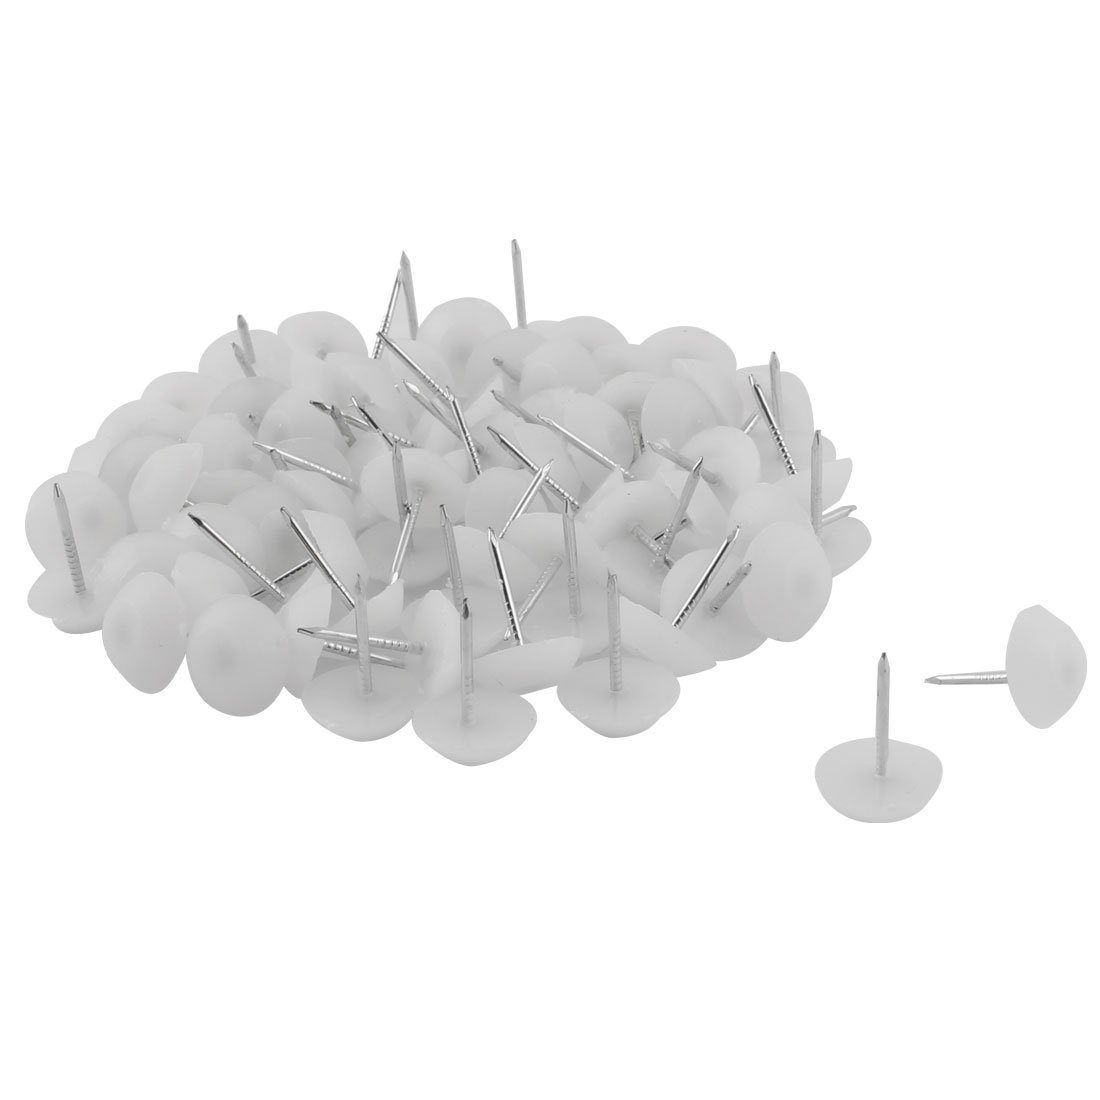 Furniture Chair Plastic Leg Feet Protector Non-slip Nails White 1.2cm Dia 80pcs